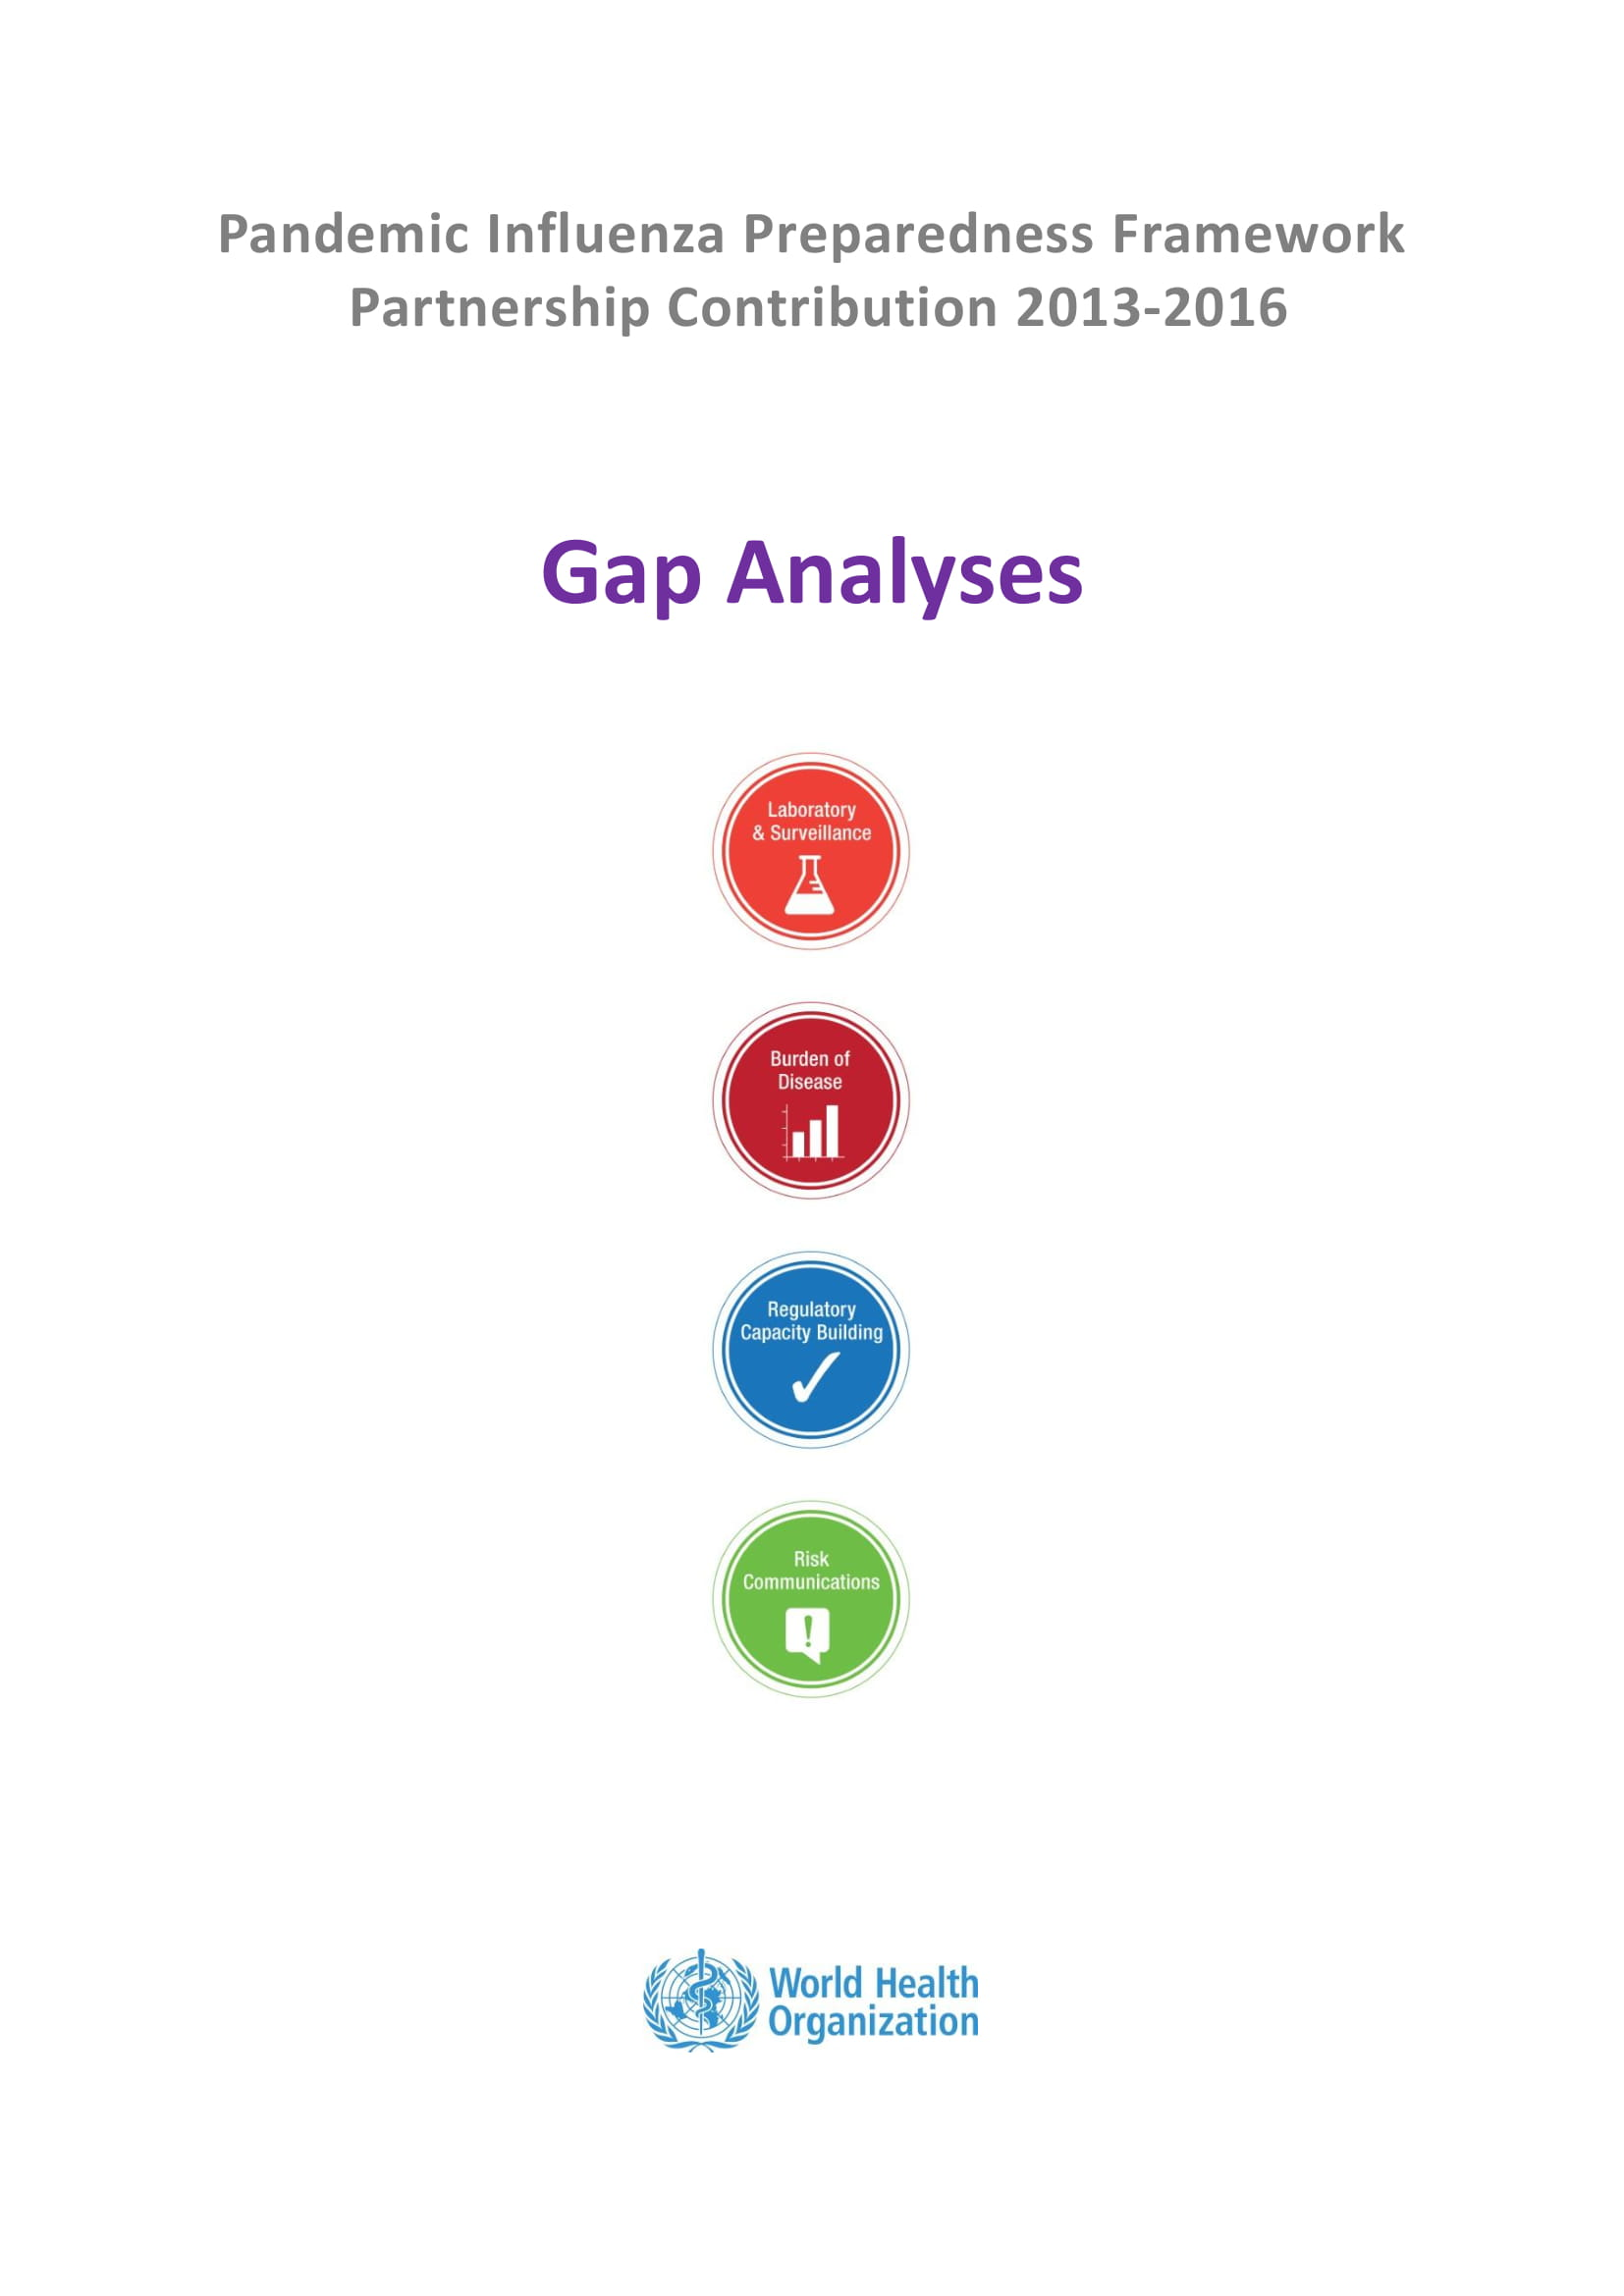 healthcare gap analysis pandemic influenza preparedness framework partnership contribution example 01